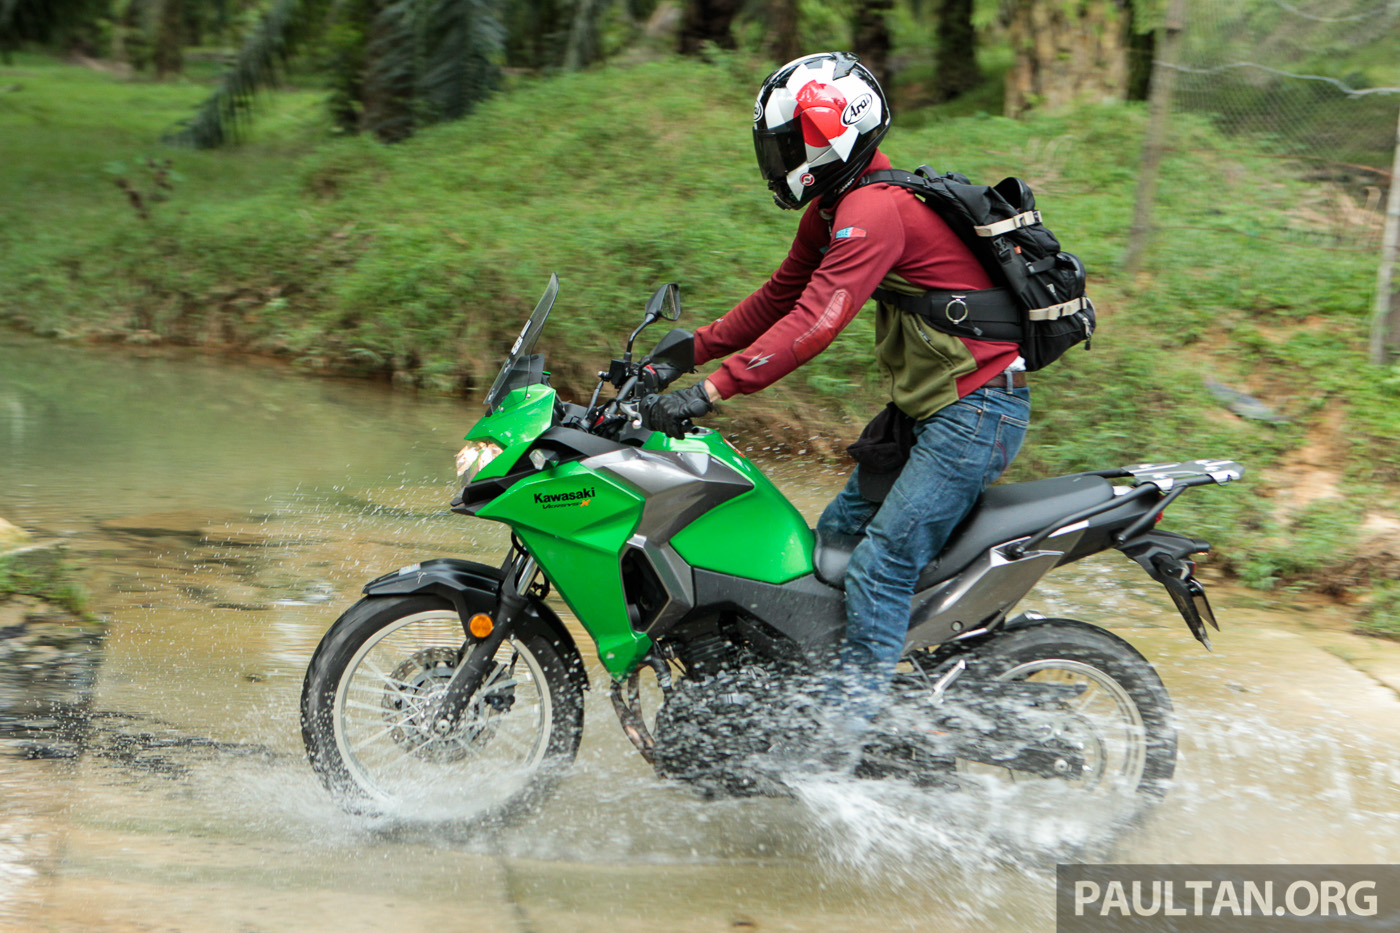 Kawasaki Test Ride Roadshow At Melawati Stadium, Shah Alam